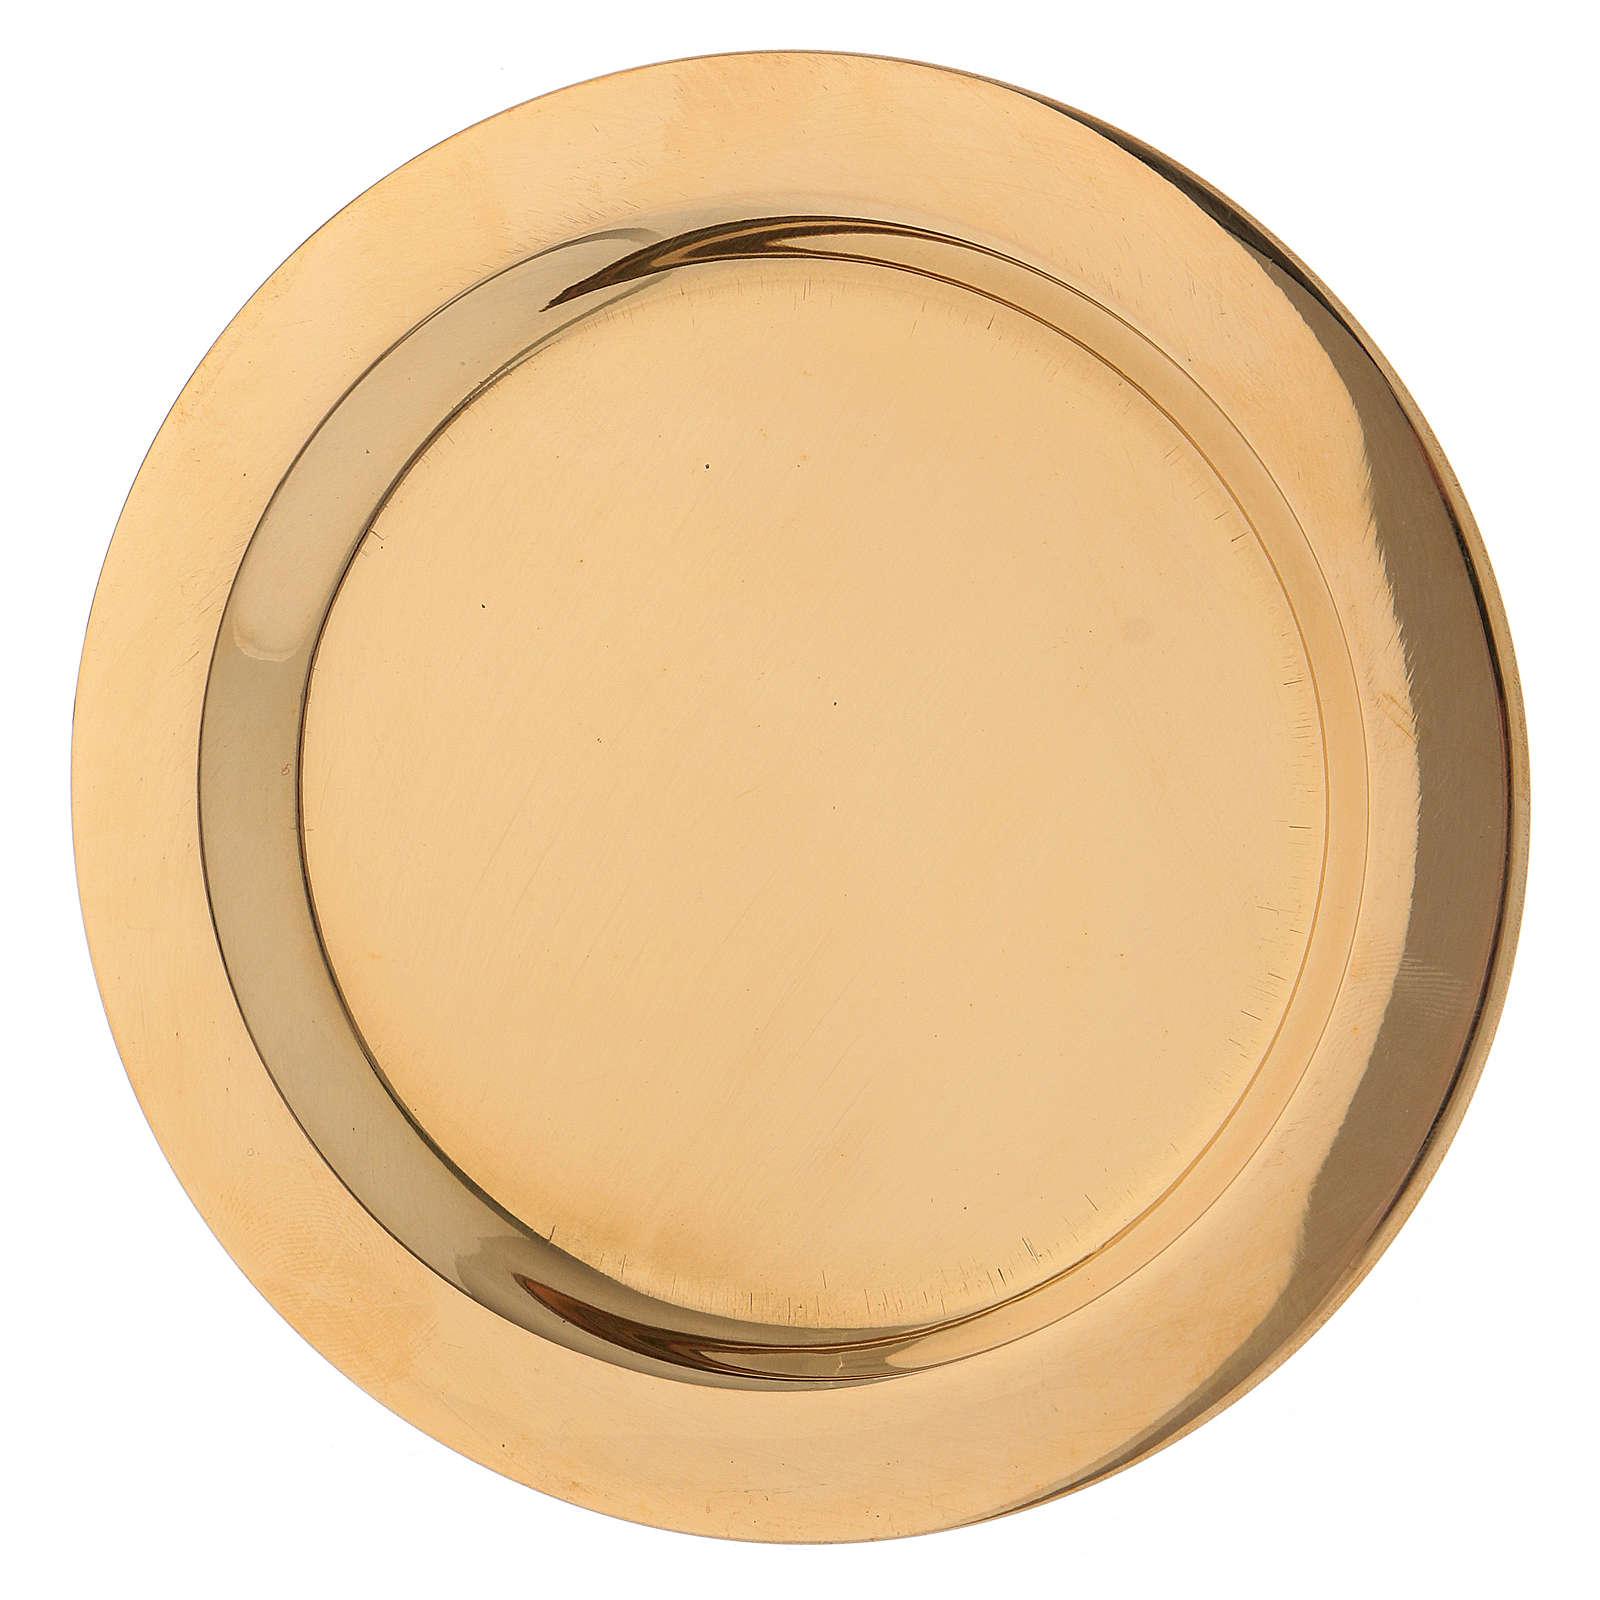 Plato portavela de latón lúcido dorado diámetro d. 11 cm 3